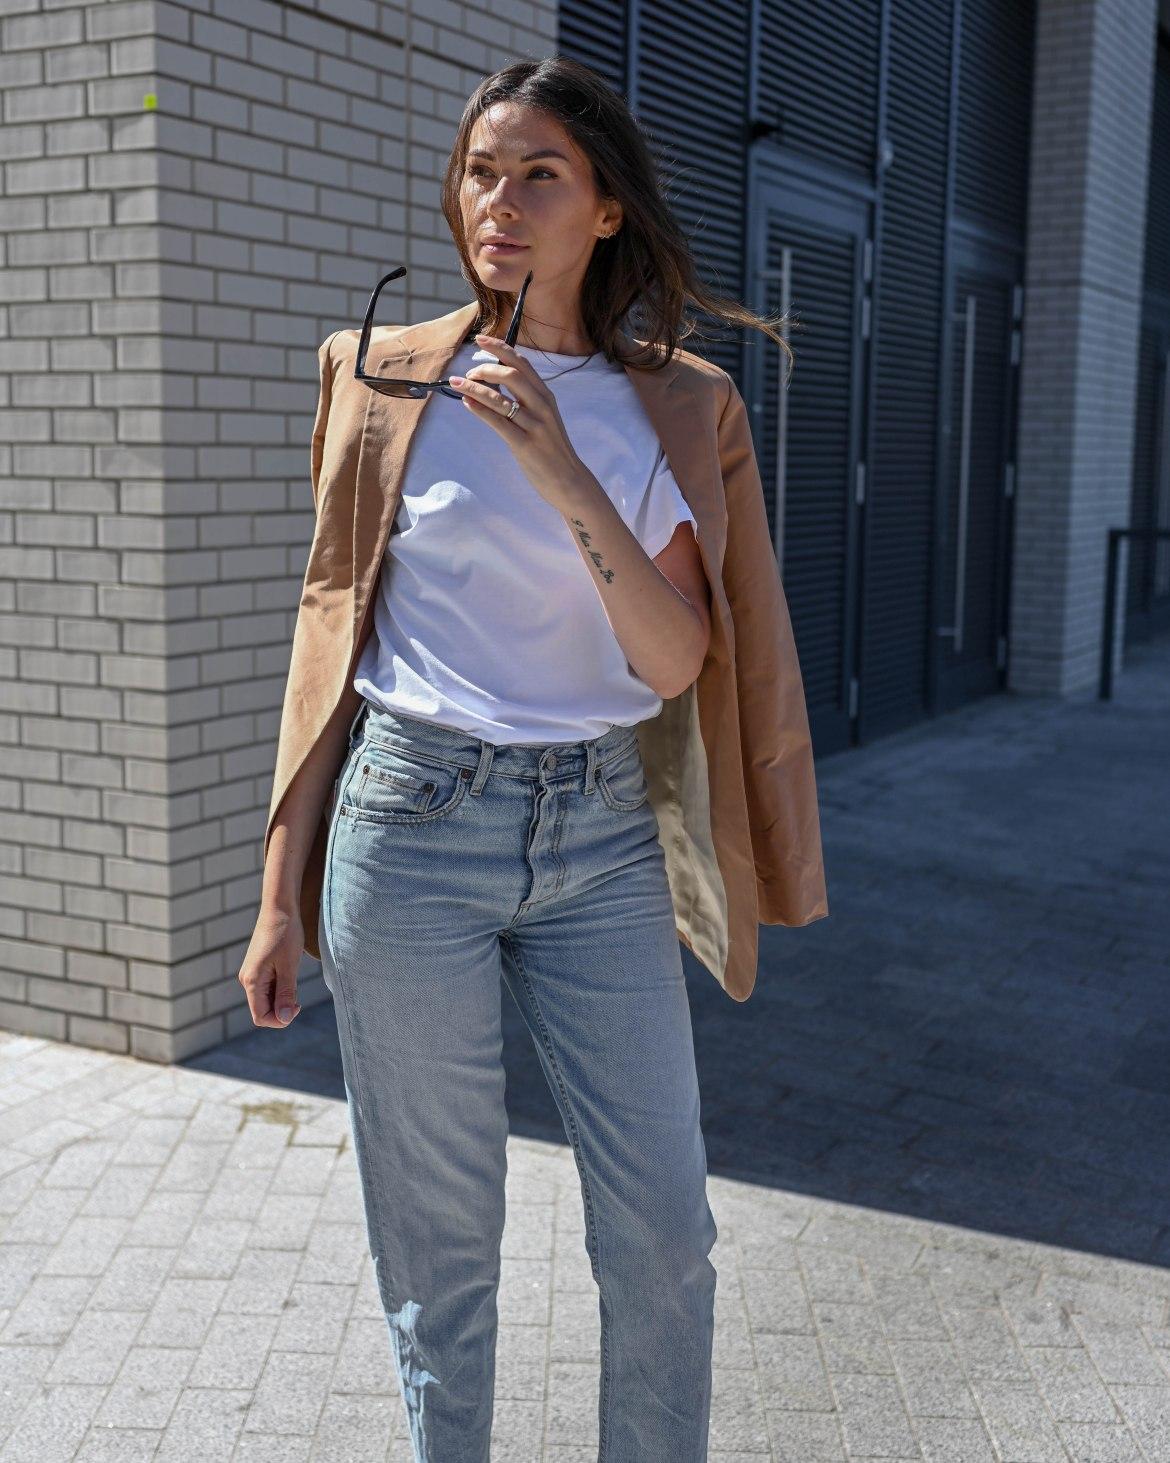 beige blazer, blue jeans and white tee